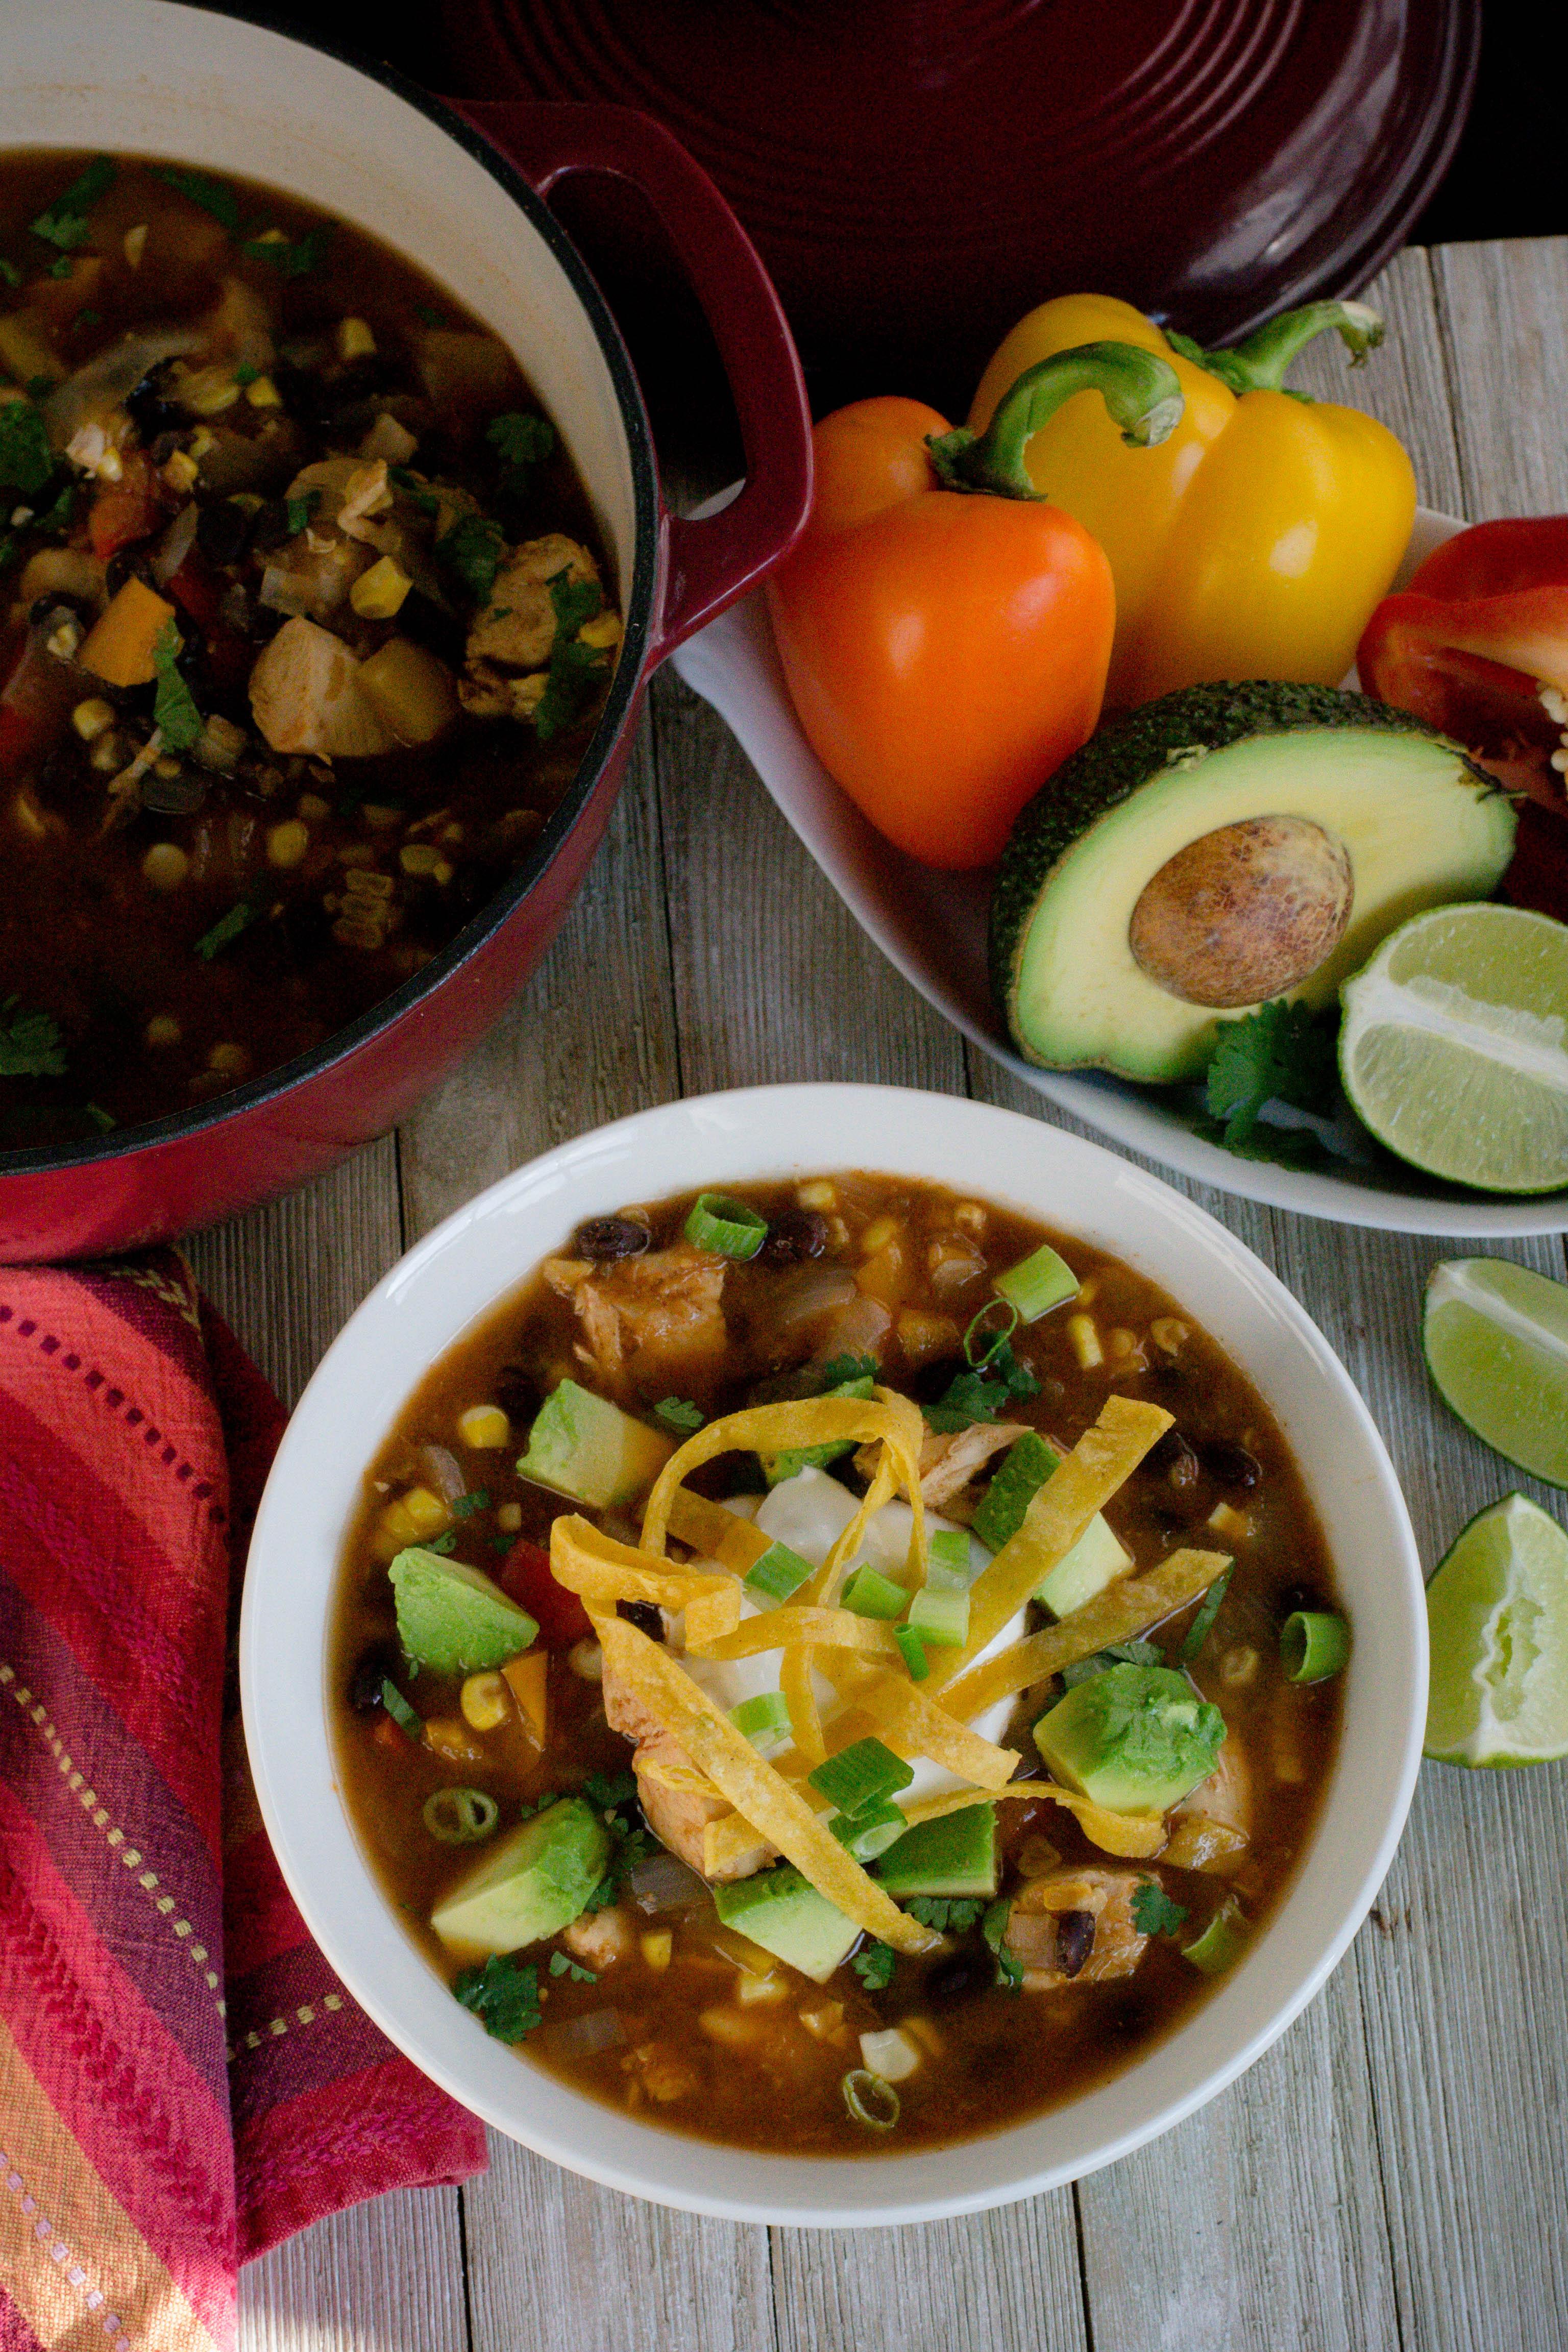 Insta Pot Salsa Verde Chicken Tortilla Soup What The Forks For Dinner